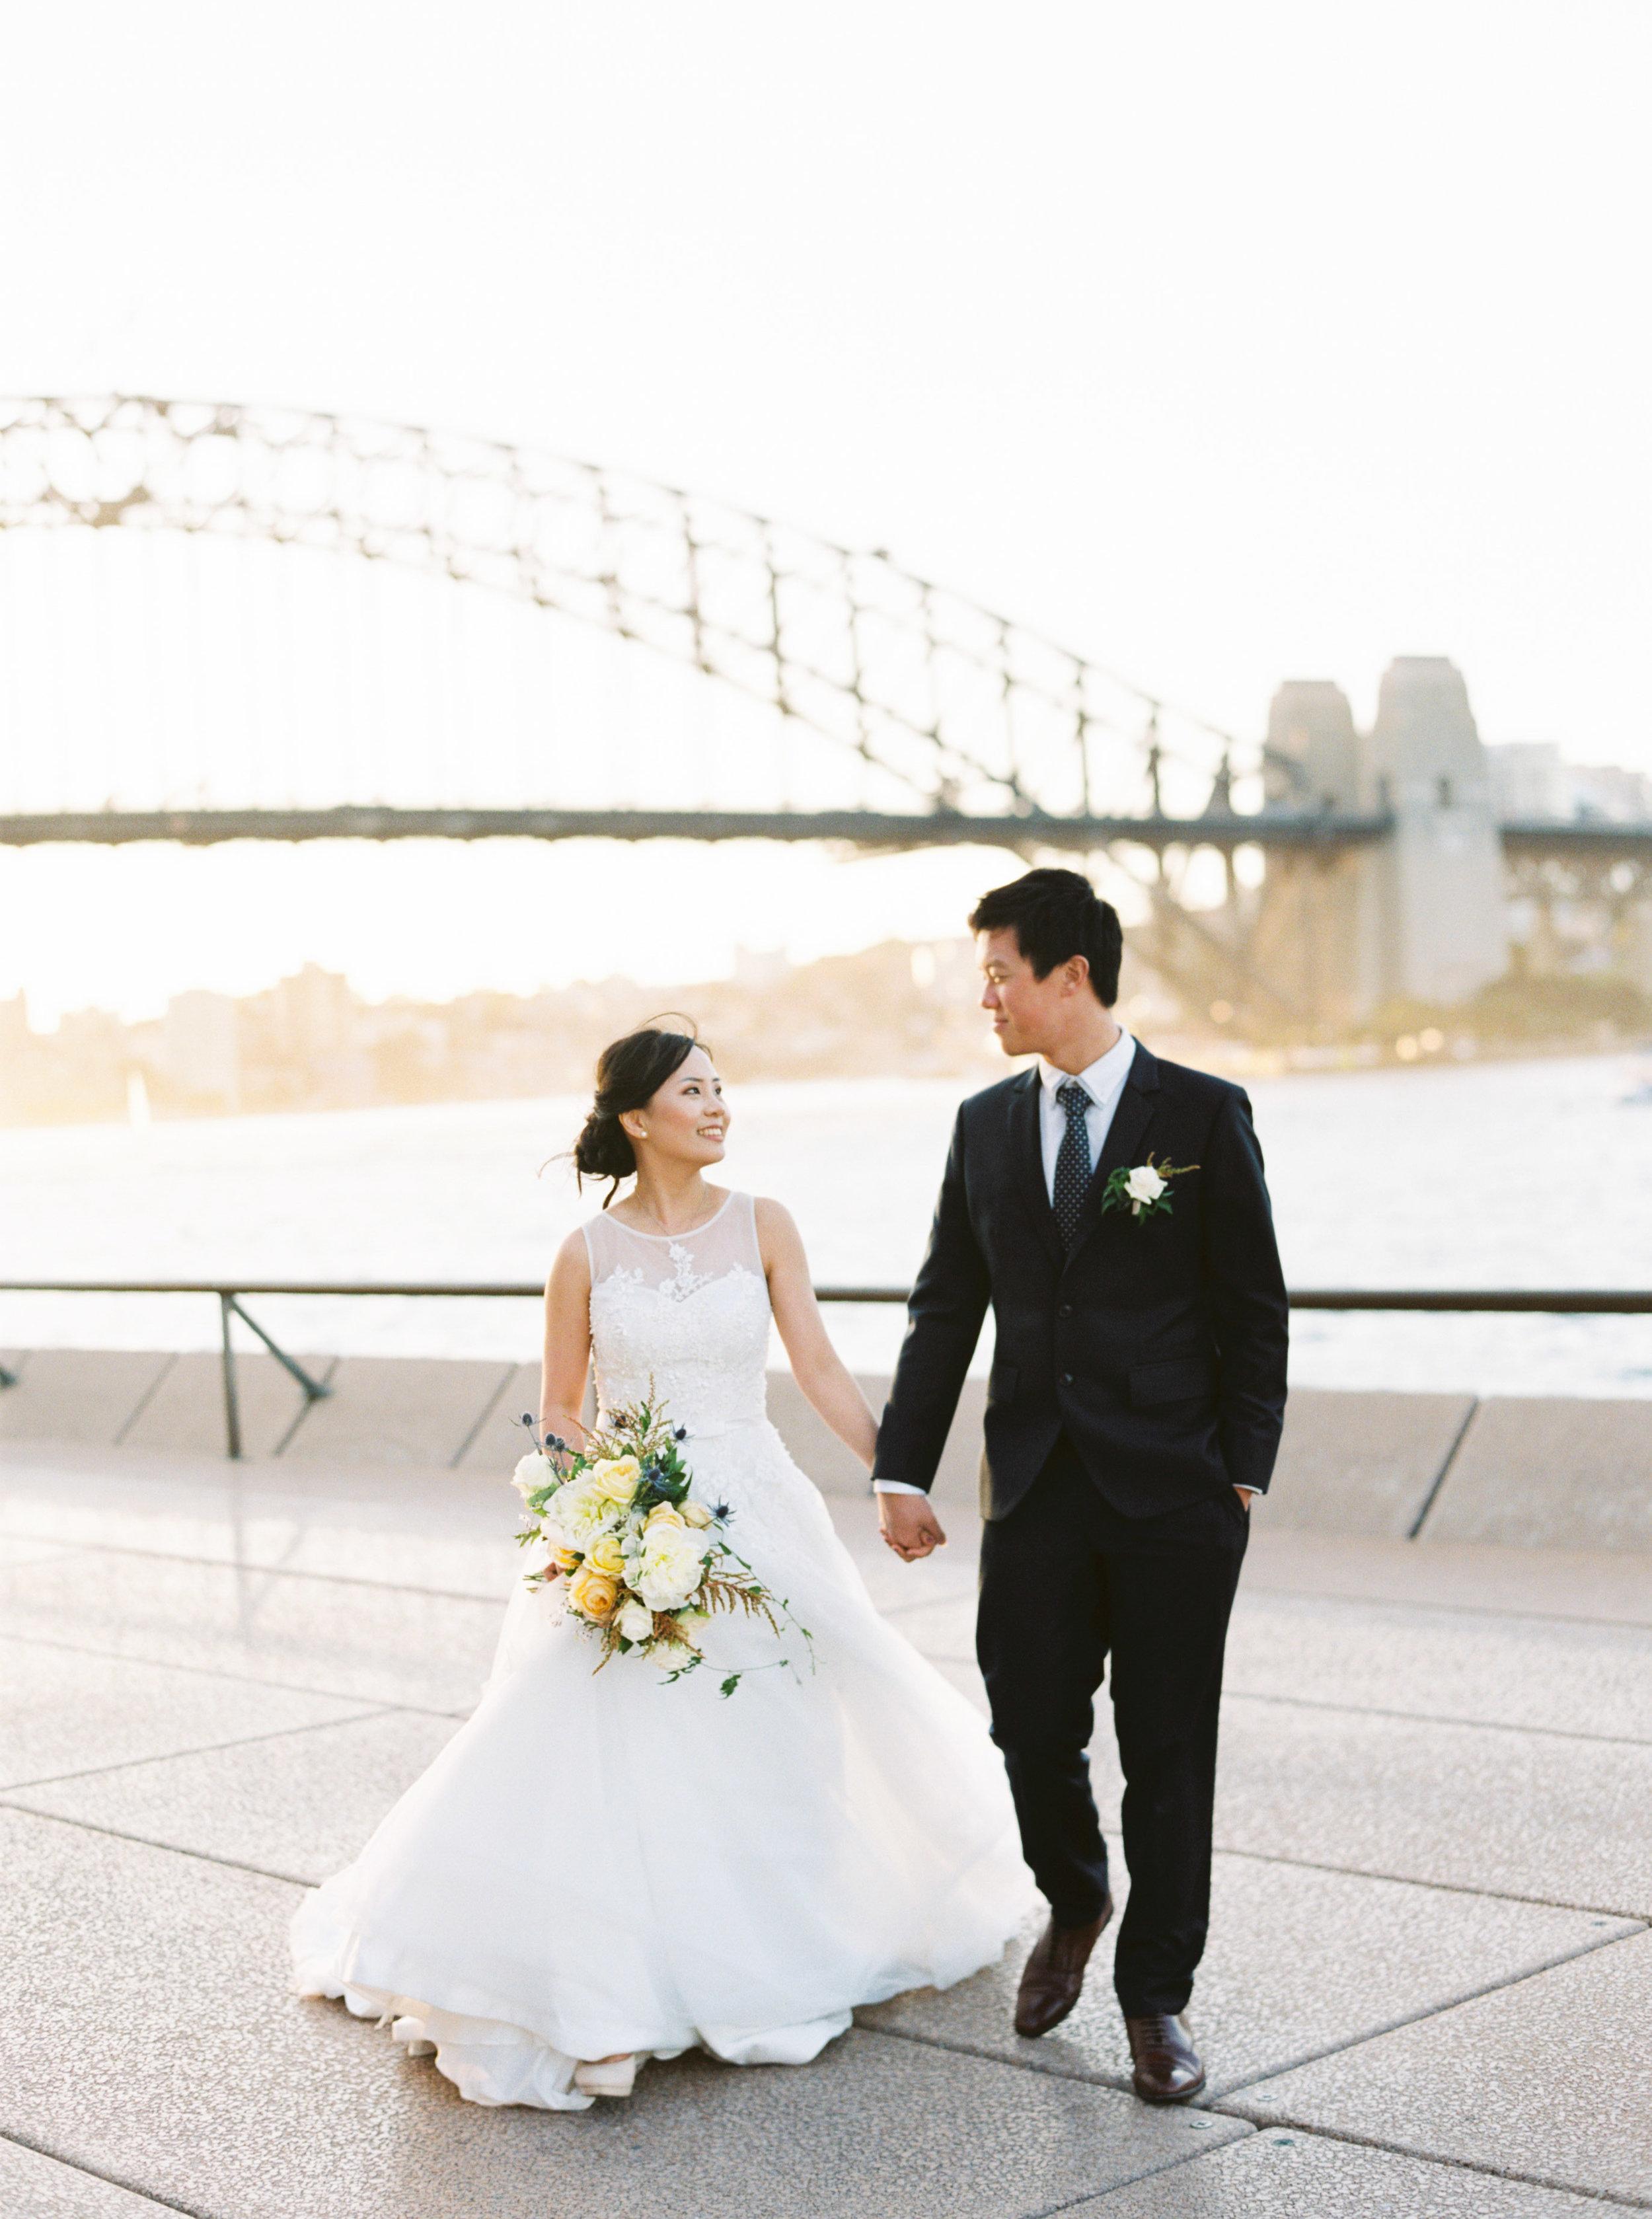 00041- Australia Sydney Wedding Photographer Sheri McMahon.jpg